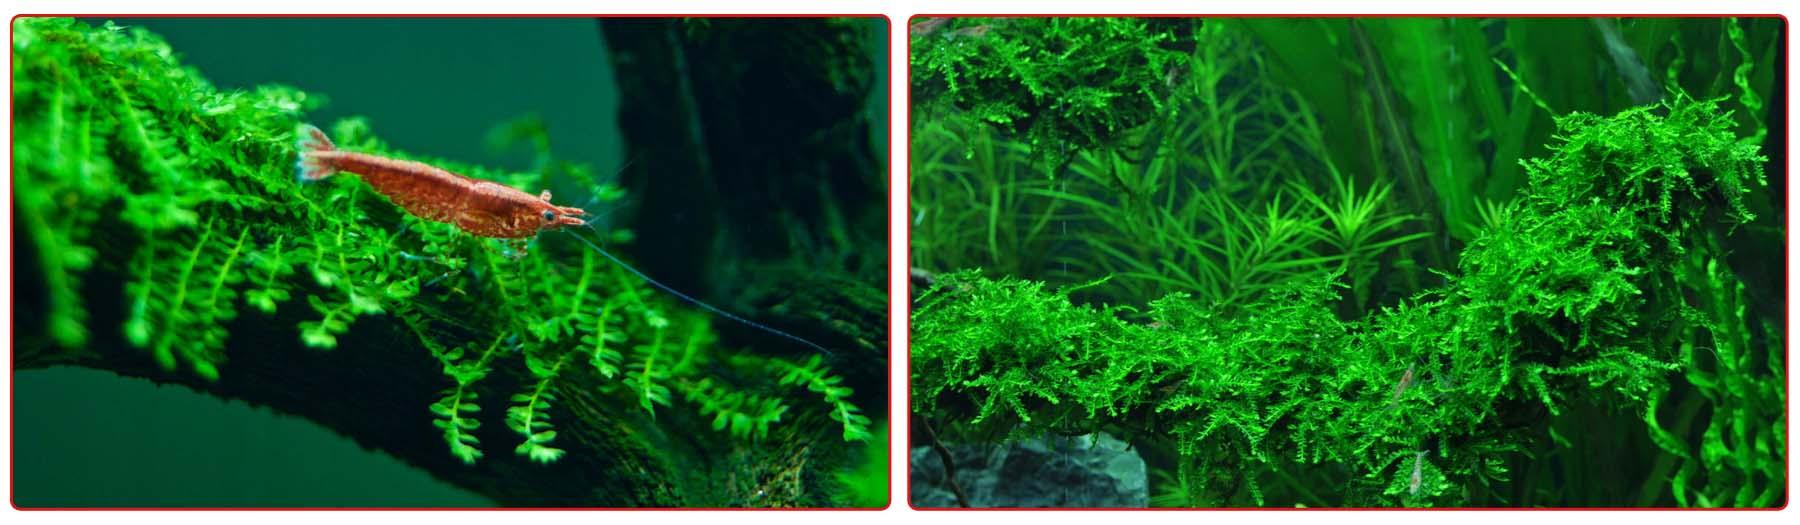 Плачущий мох в аквариуме